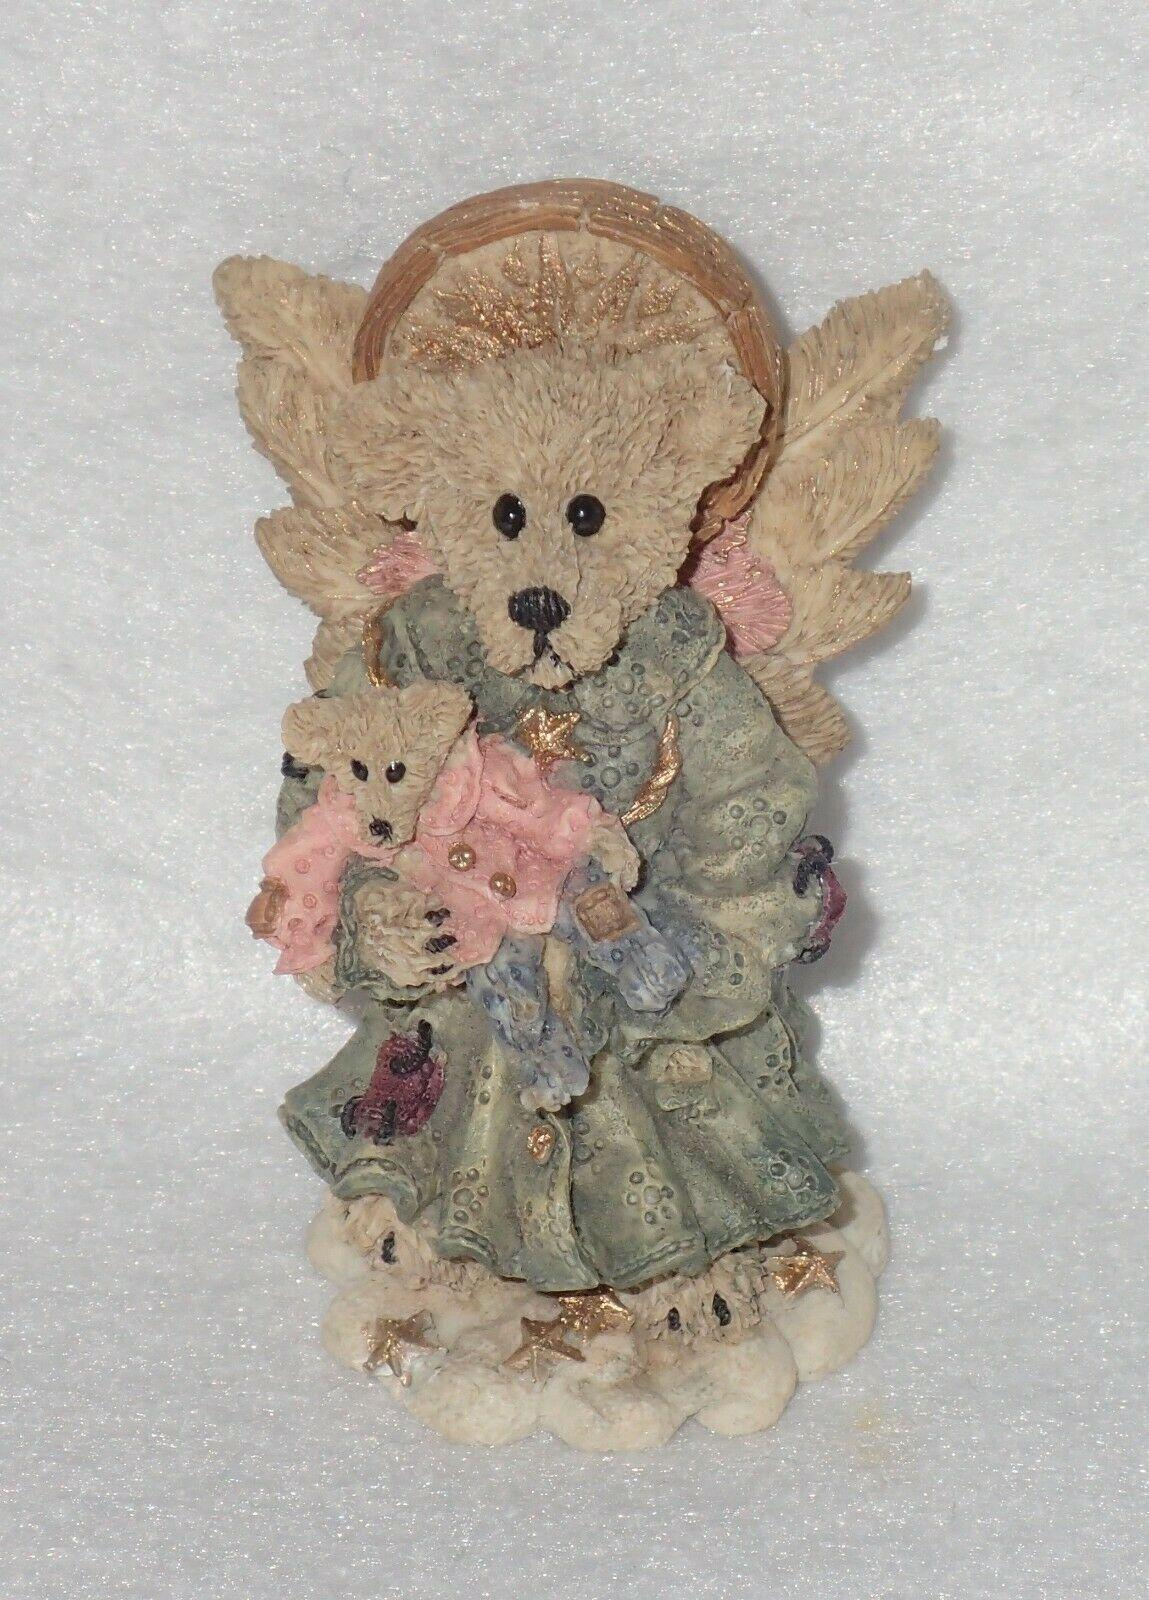 Boyd Bearstone Resin Bears Zoe The Angel Of Life Figurine #2286 NEW IN BOX